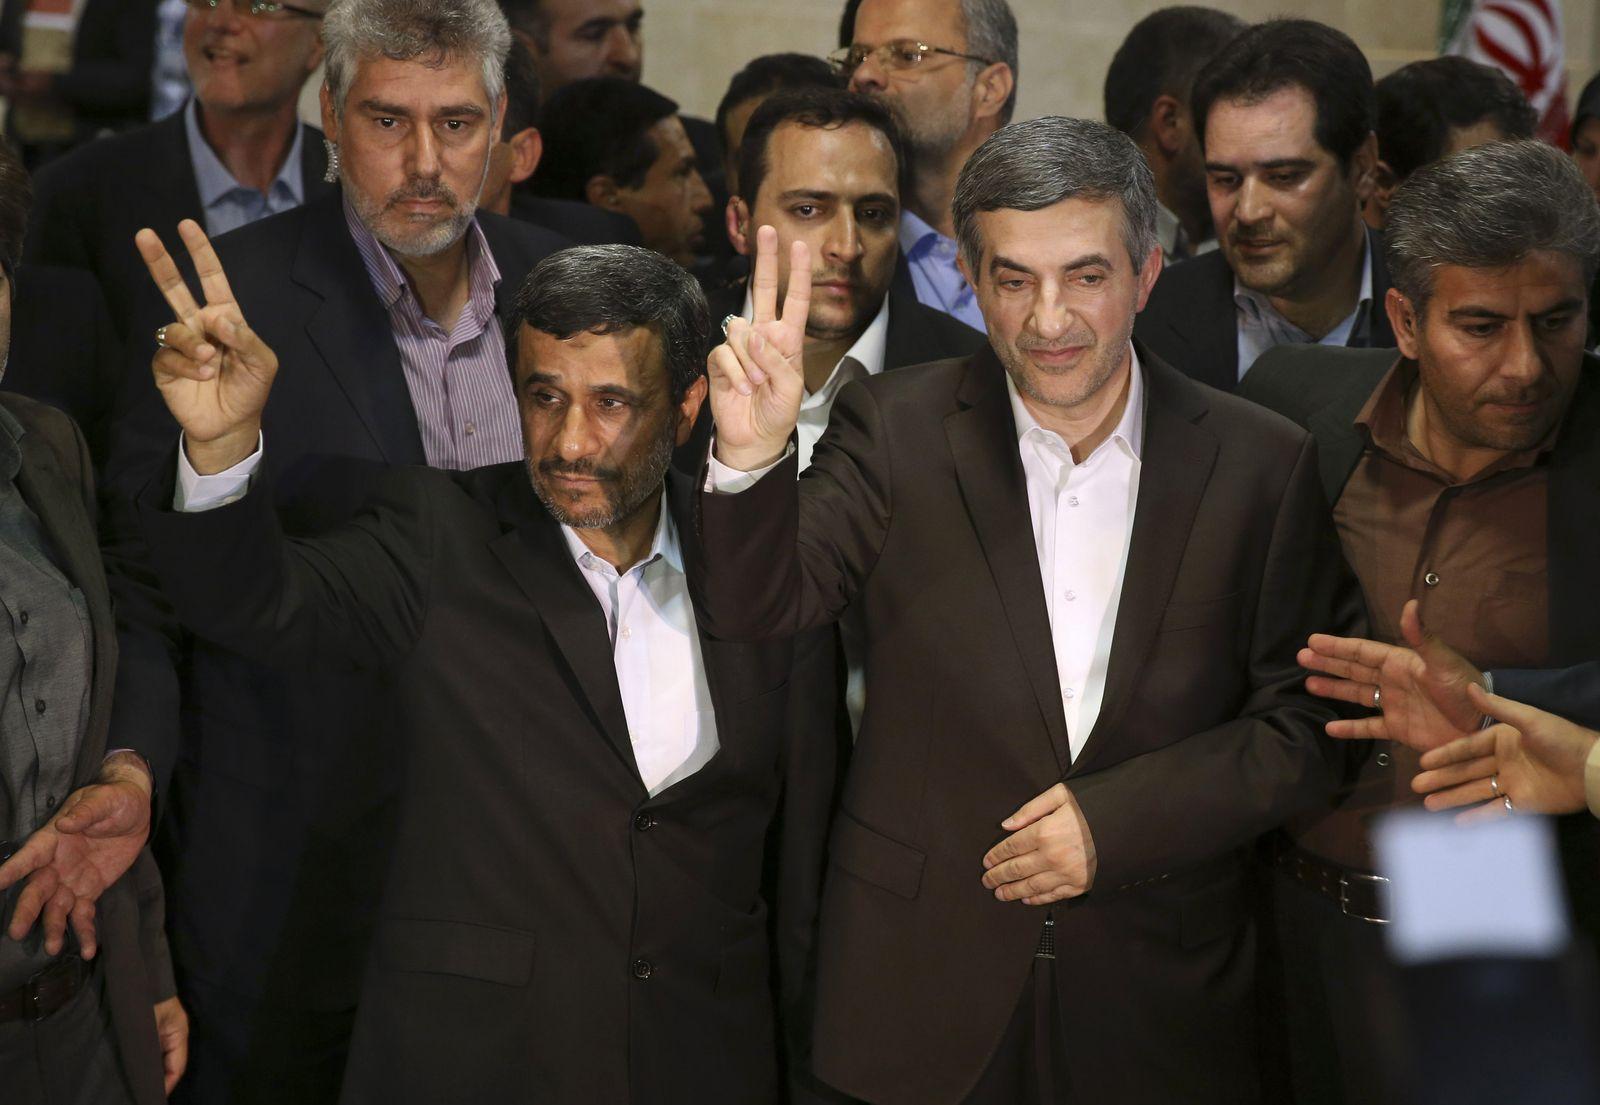 Mahmoud Ahmadinedschad/Rahim Maschai